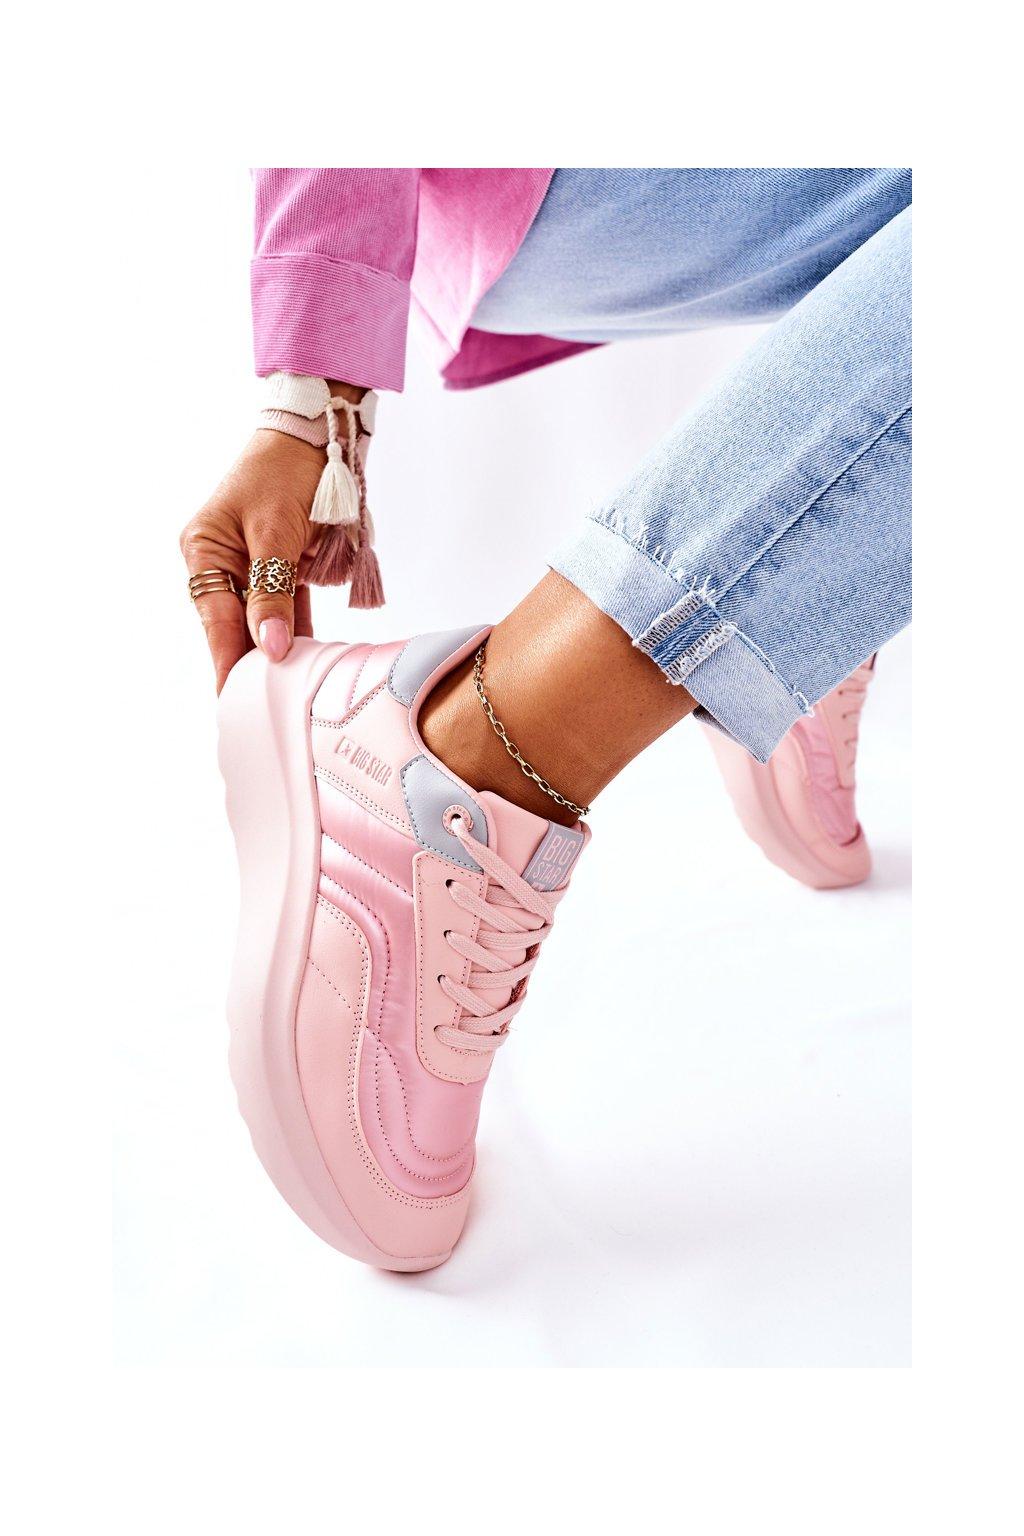 Dámske tenisky farba ružová NJSK II274333 PINK